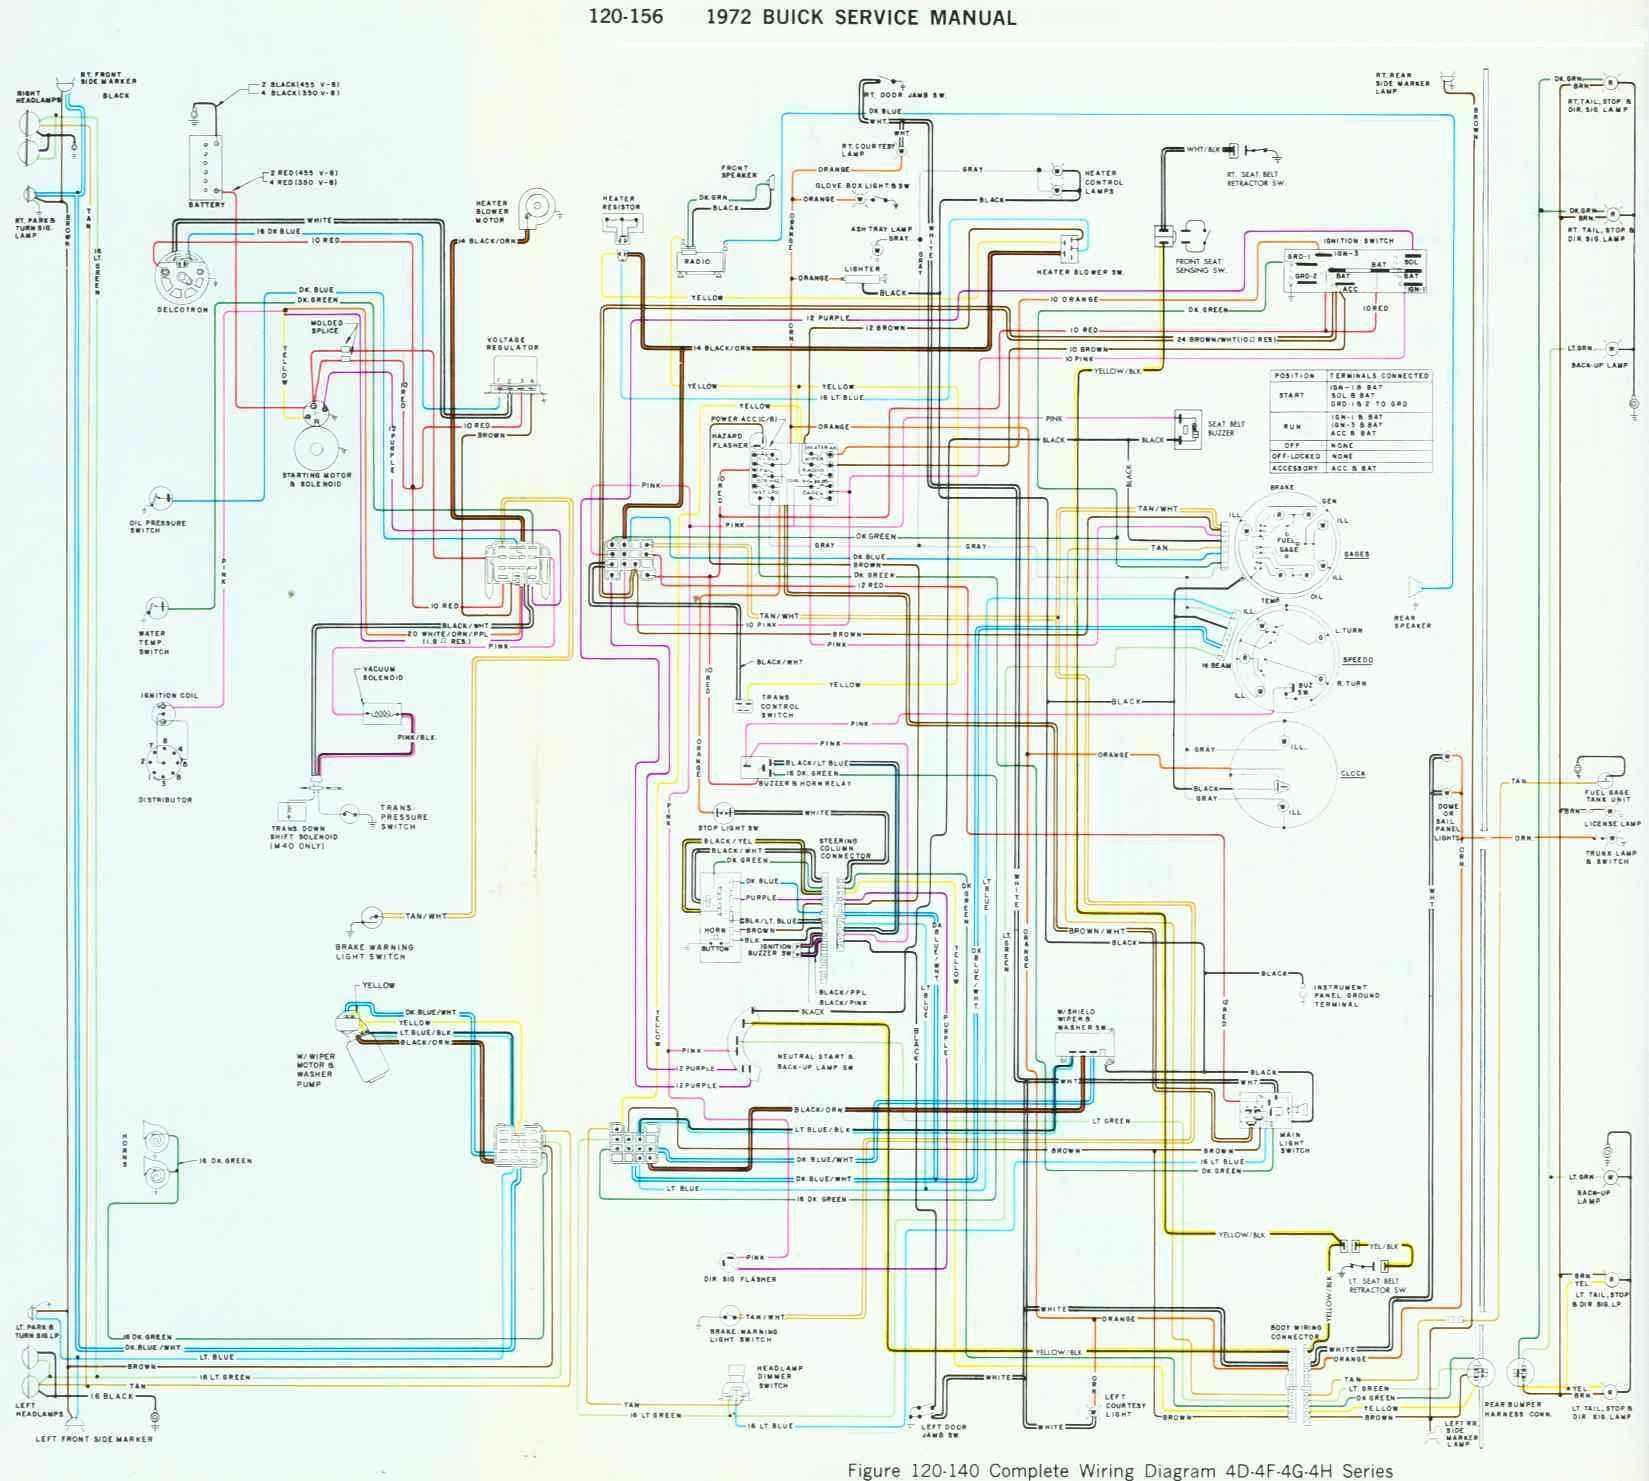 96 buick ac wiring diagram schematic wiring diagrams u2022 1975 buick 1970 buick ac diagram [ 1649 x 1481 Pixel ]